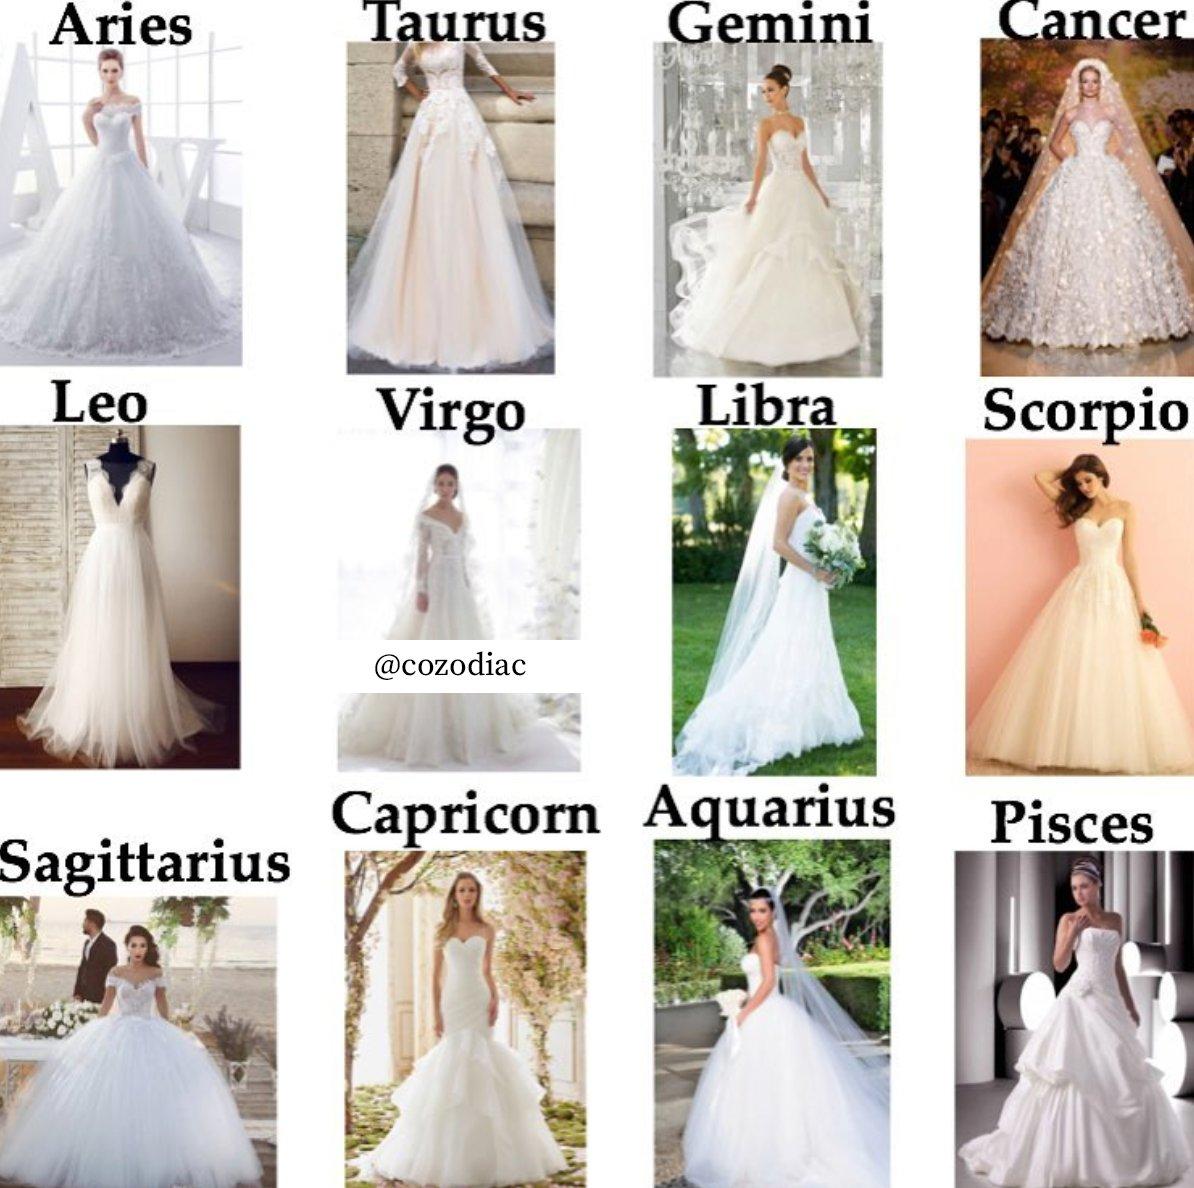 Follow us @cozodiac for more list this :)  #zodiac #zodiacsigns #starsigns #astrology #horoscope #aries #taurus #gemini #cancer #leo #virgo #libra #scorpio #sagittarius #capricorn #aquarius #pisces #zodiacastrology #starsign #zodiacfacts #zodiacsign #astrologypost #zodiacmemes pic.twitter.com/rXE0AOAE93